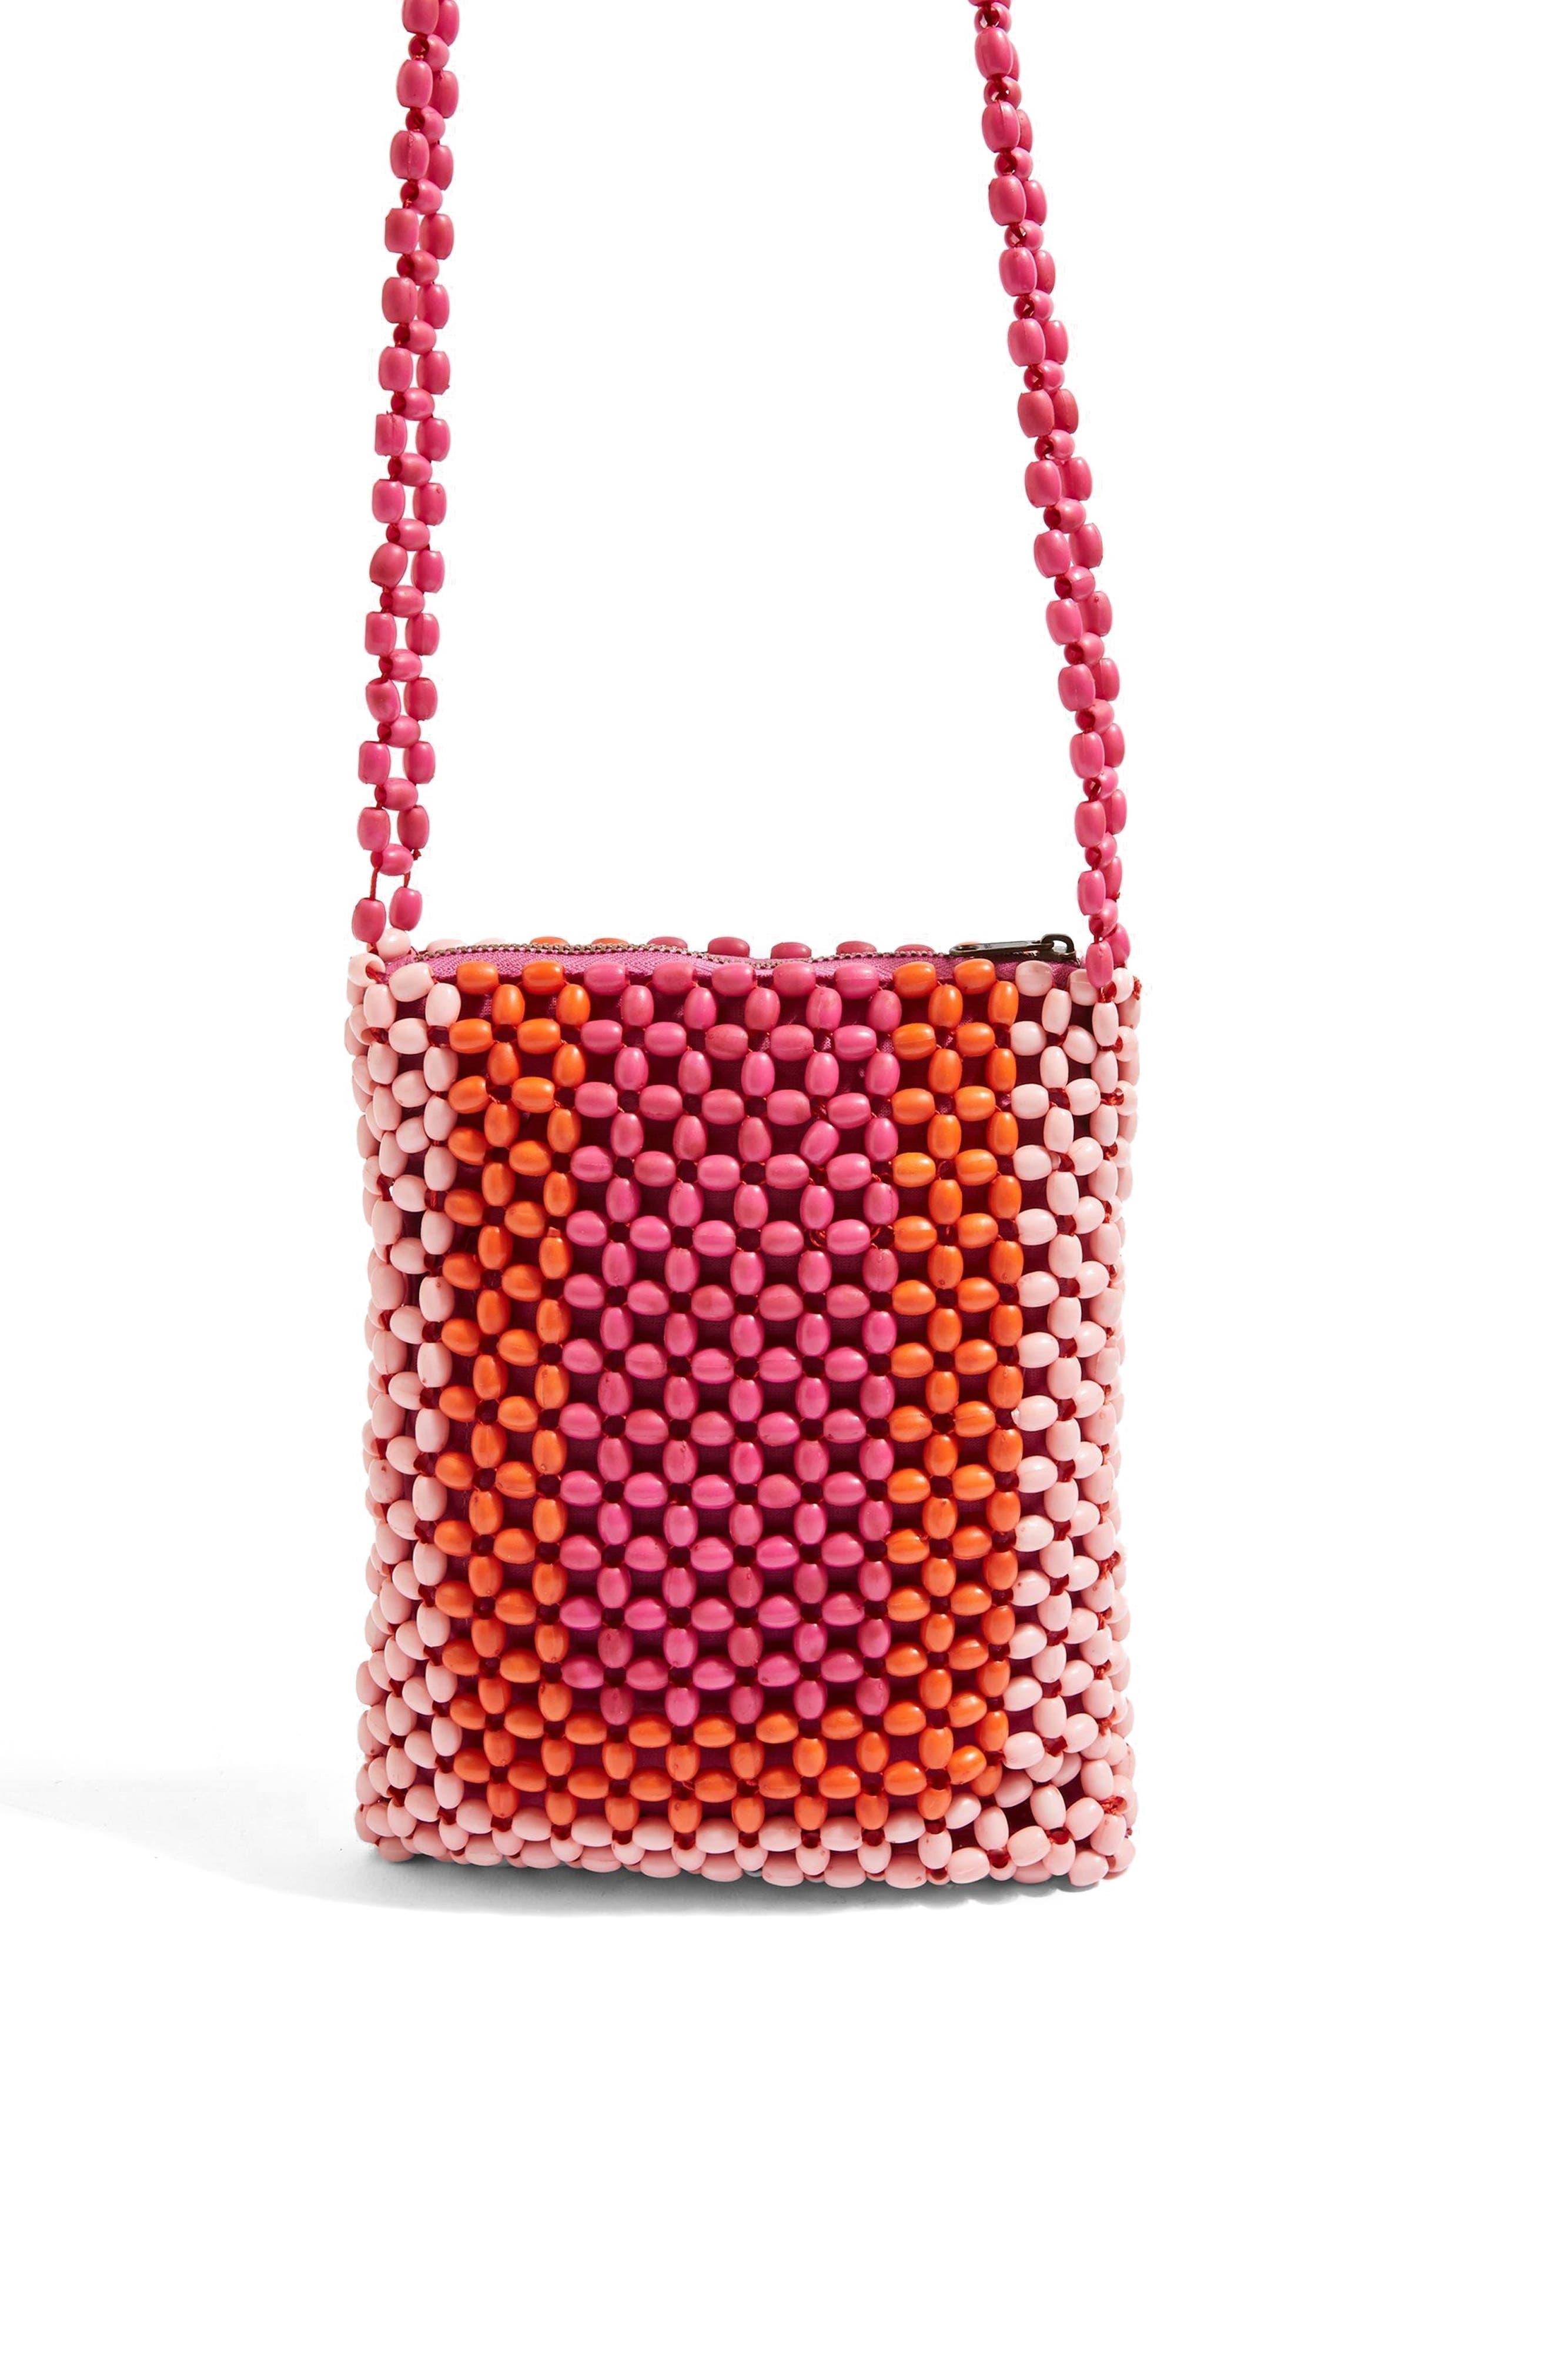 Topshop Pink Beaded Crossbody Bag